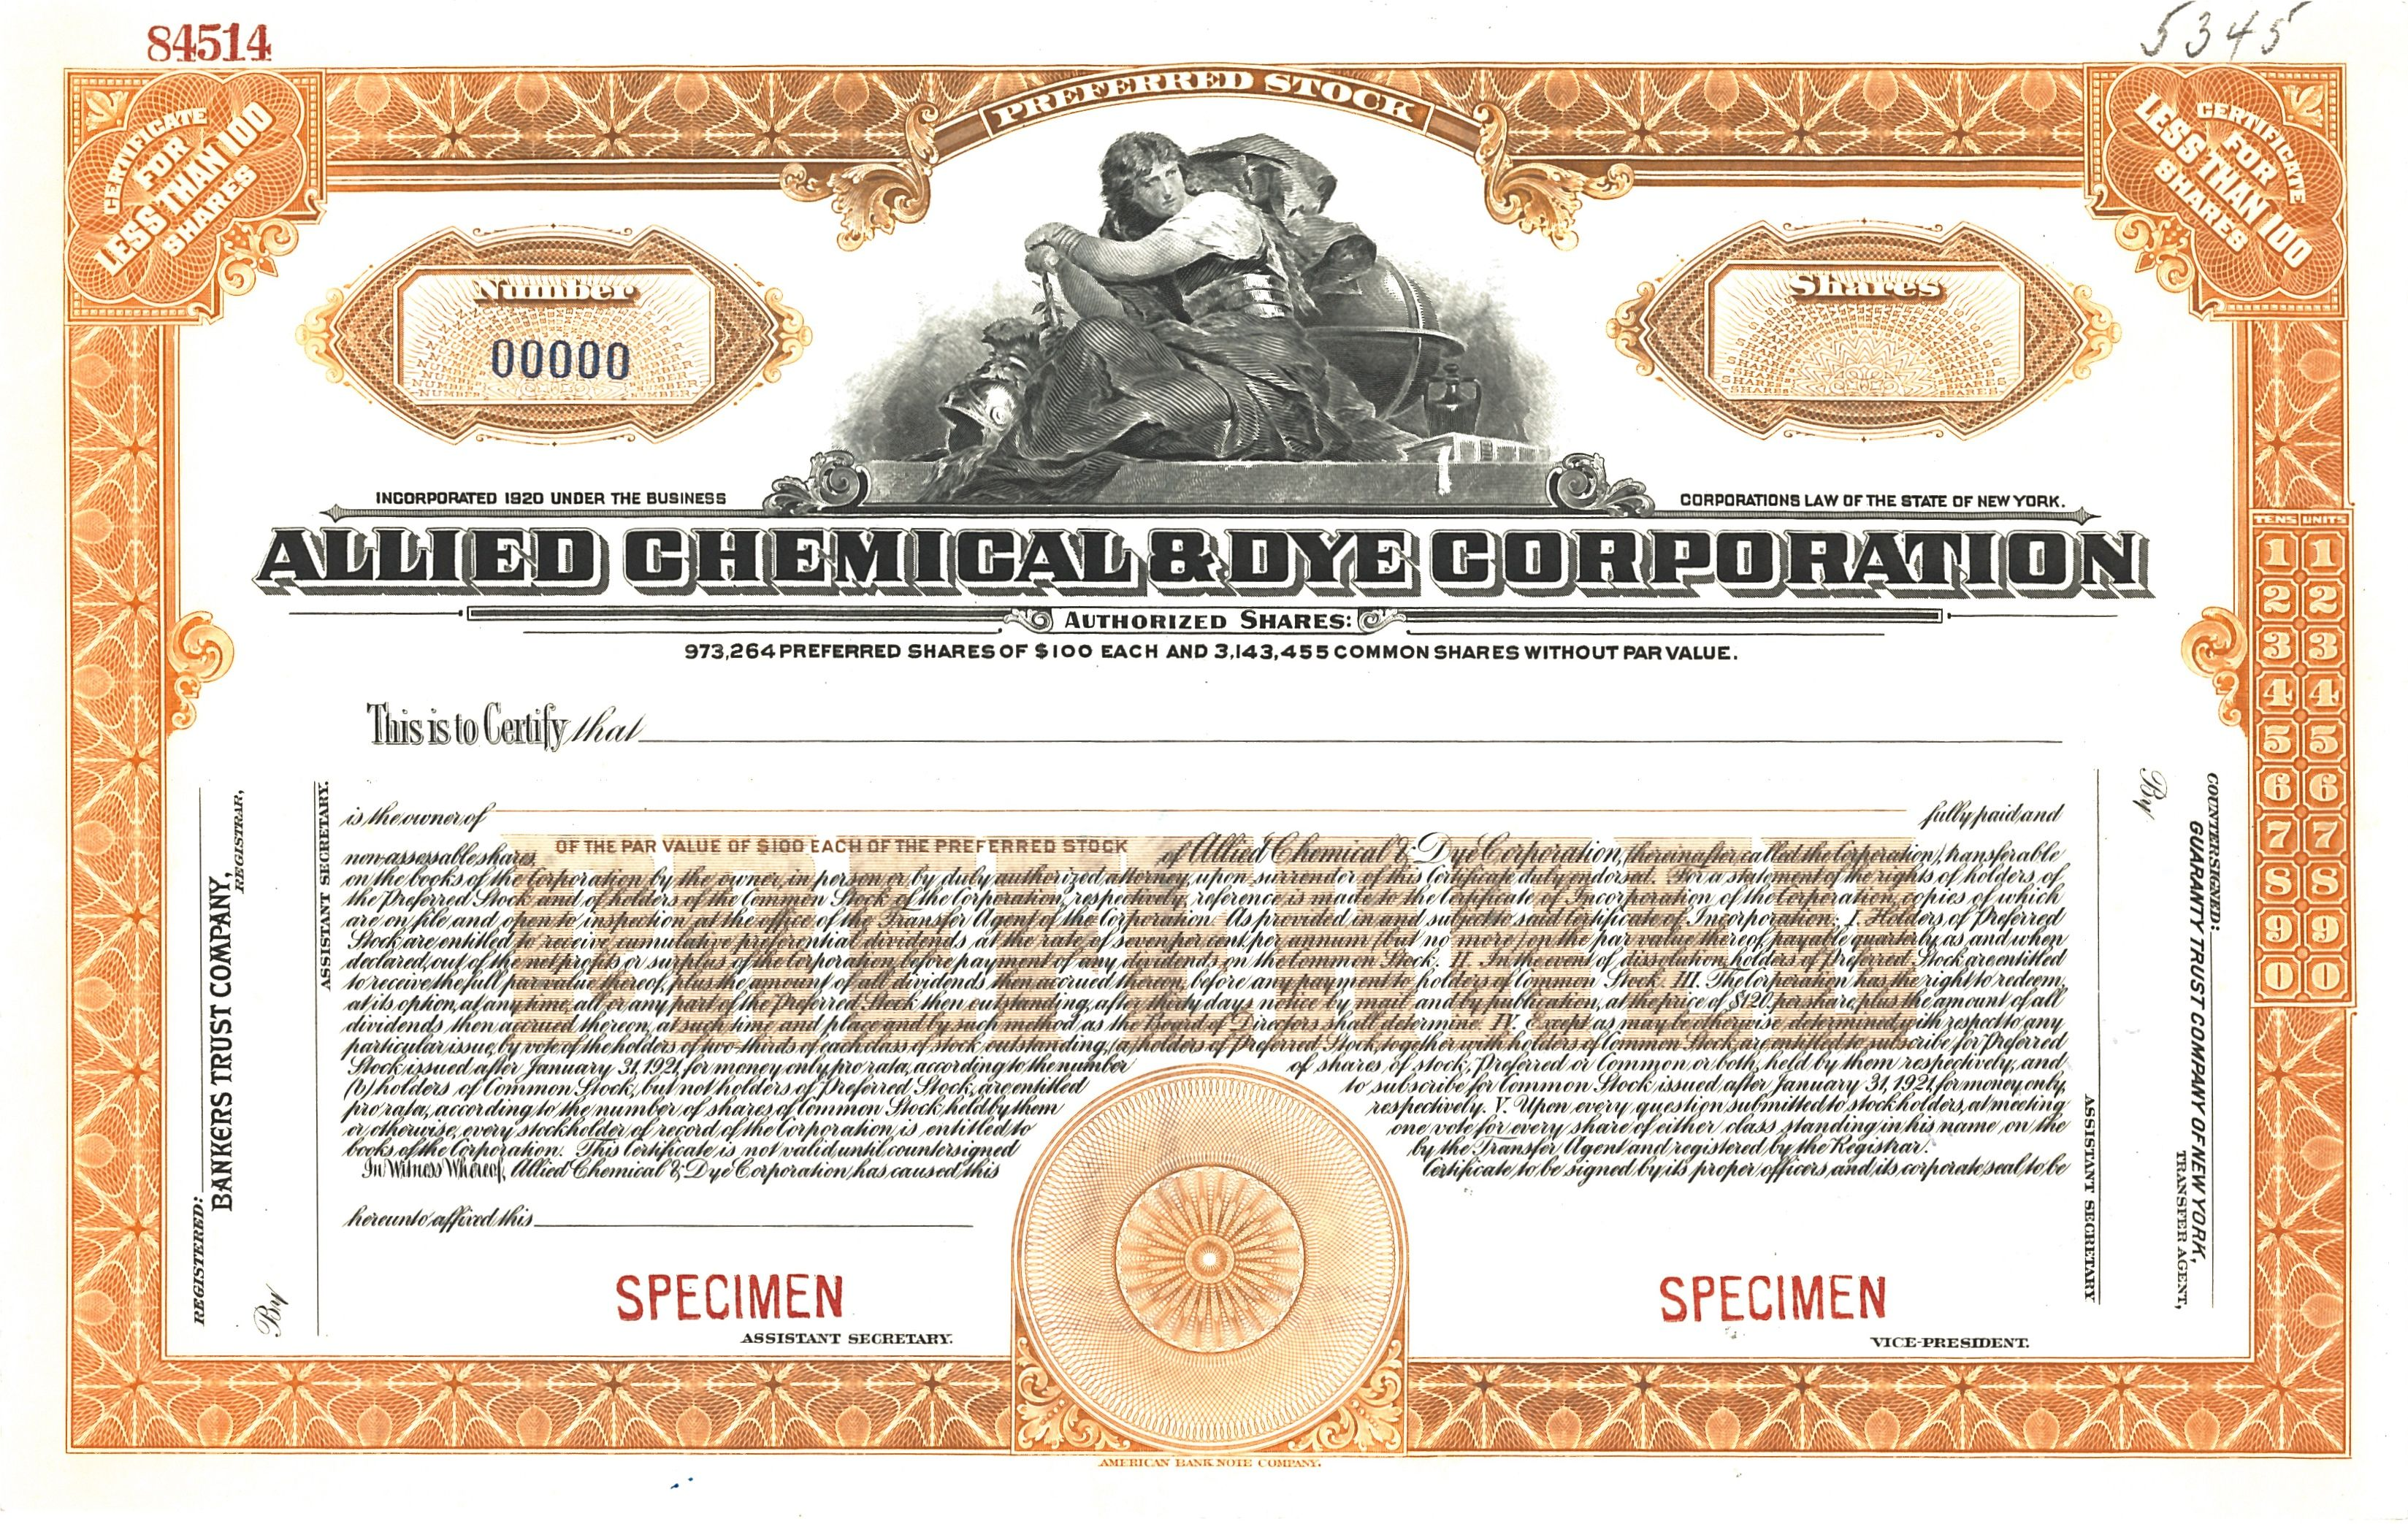 Allied Chemican & Dye Corporation preferred stock certificate, 1936 ...